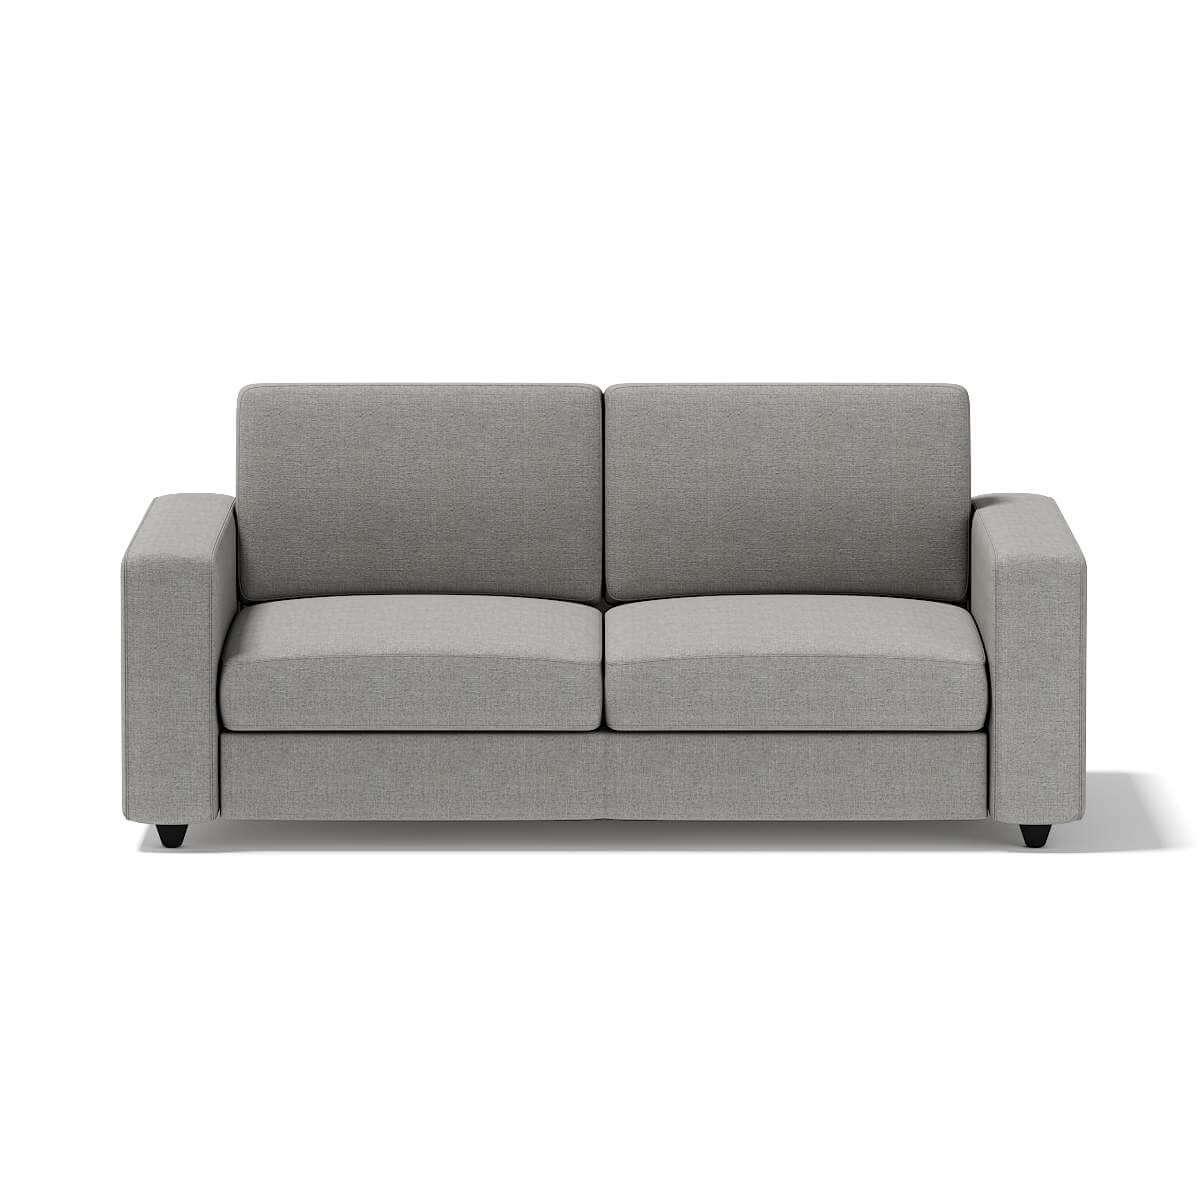 Grey Two Seat Sofa Model